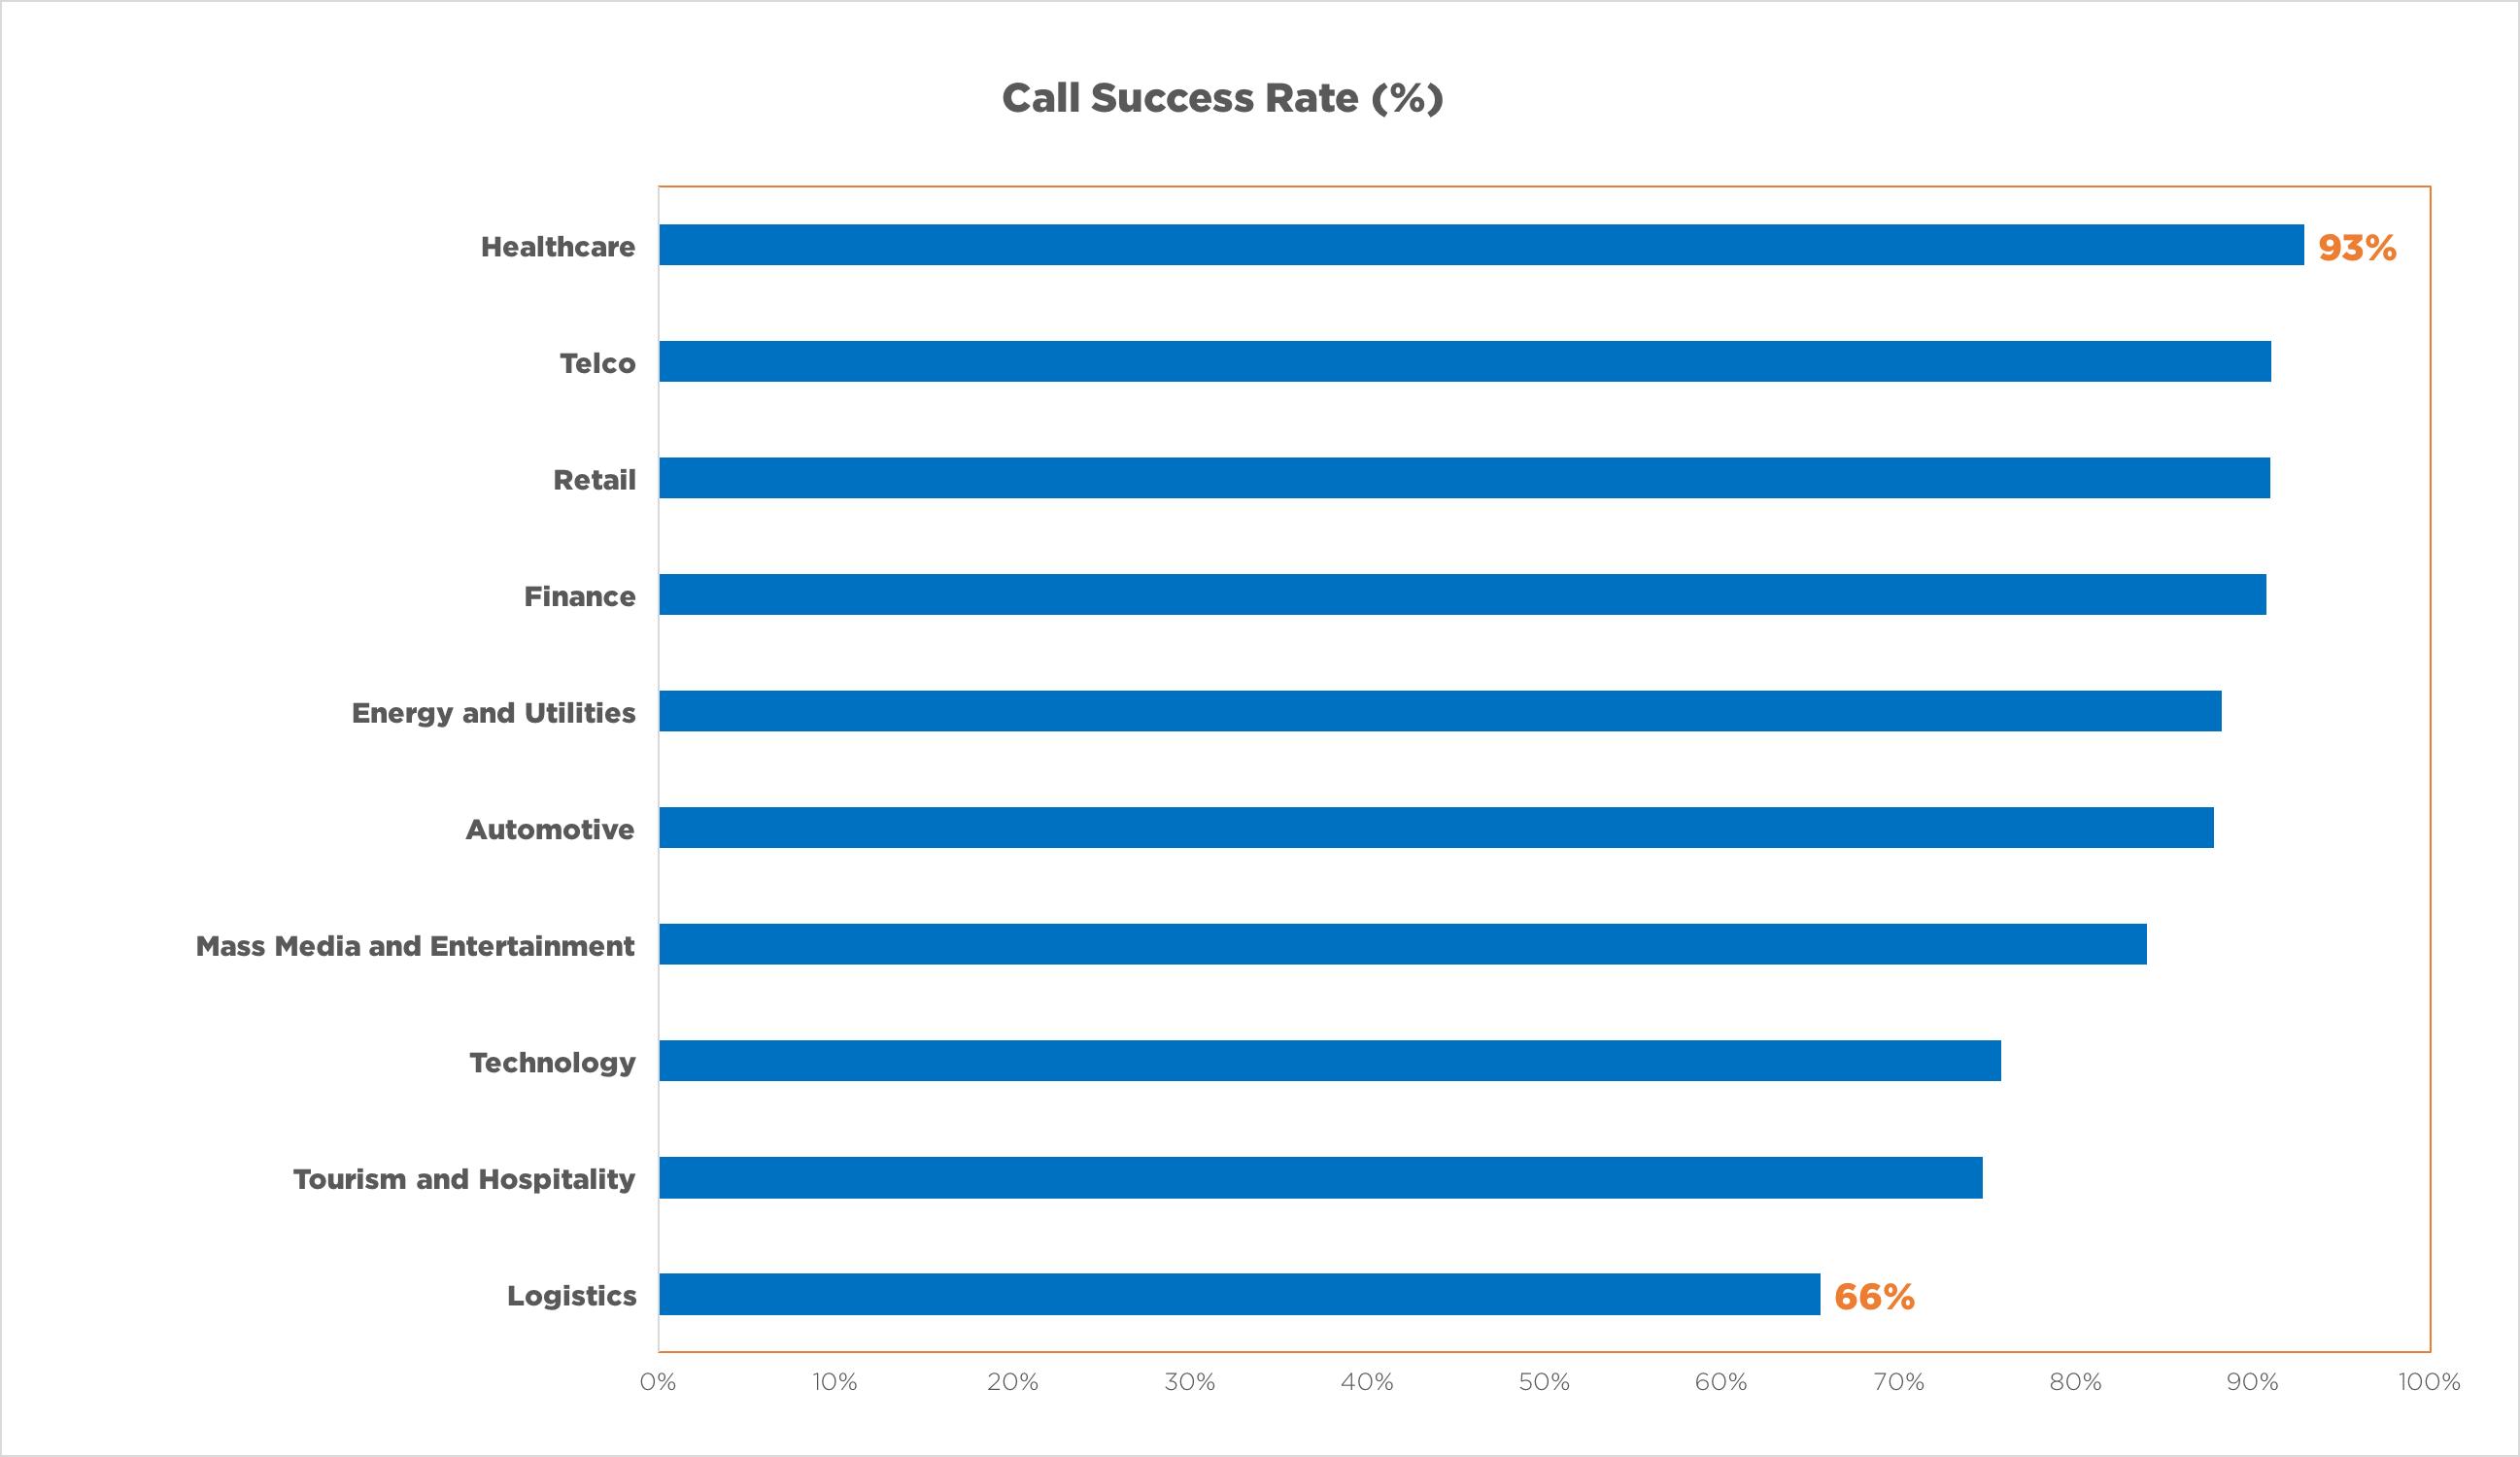 Call Success Rate